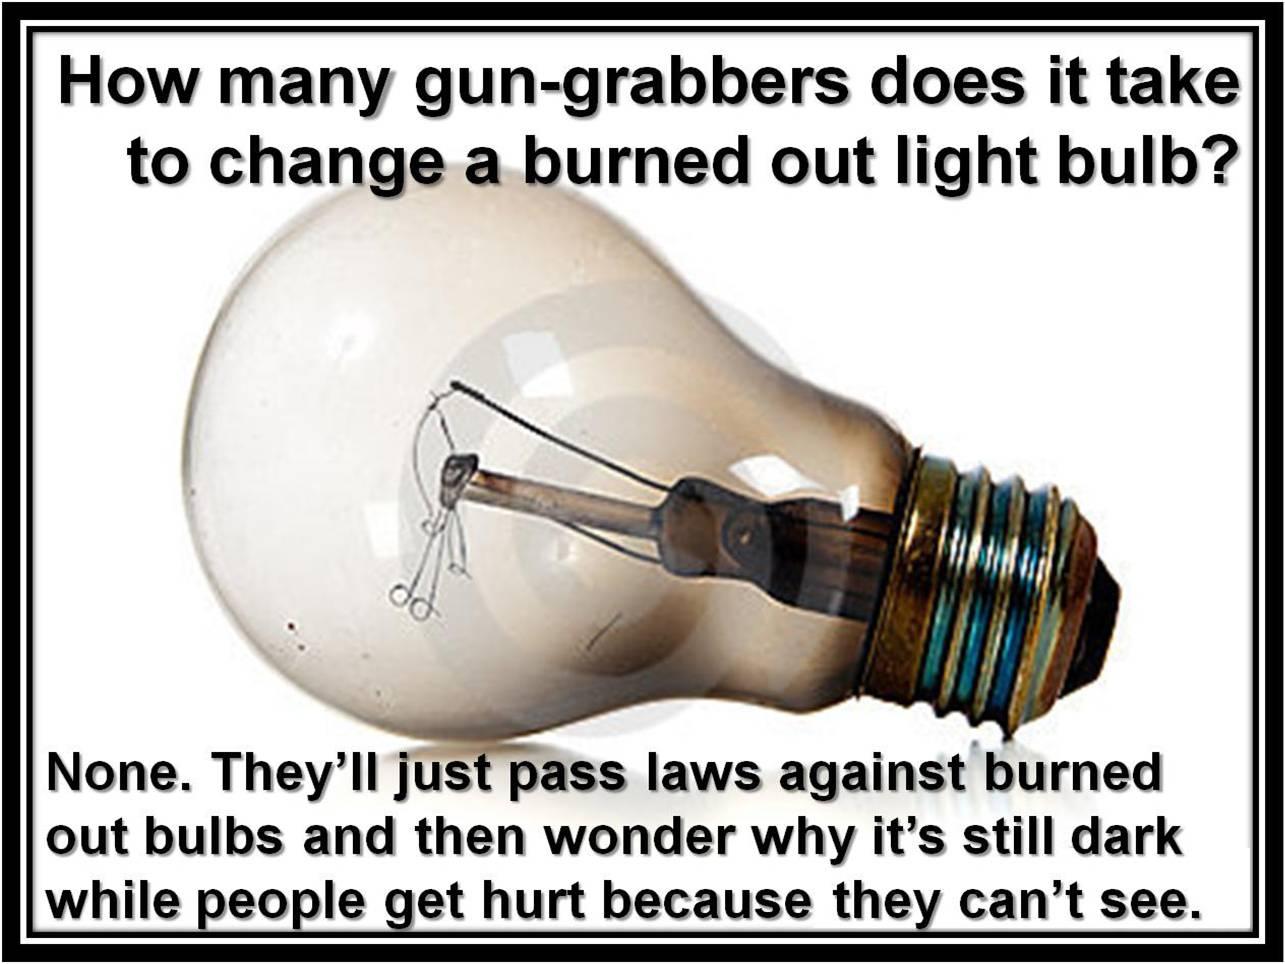 15-0614 Gun-Grabbers